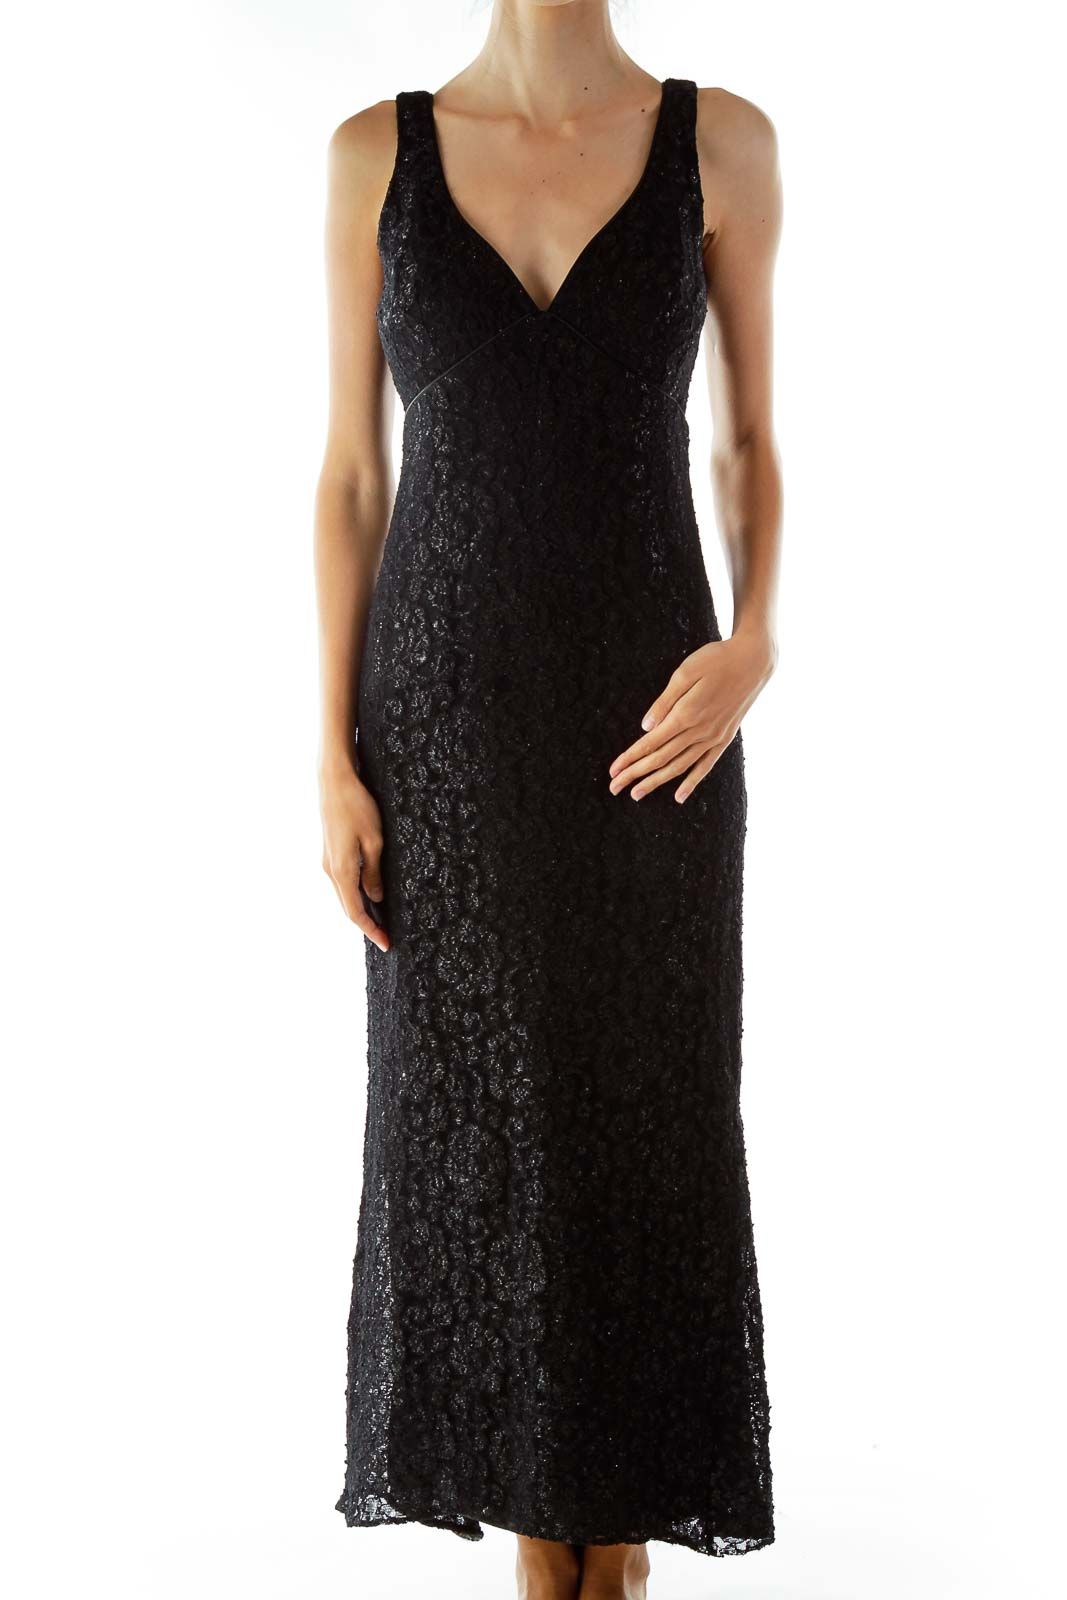 Black Lace Shimmer V-neck Sleeveless Evening Dress Front